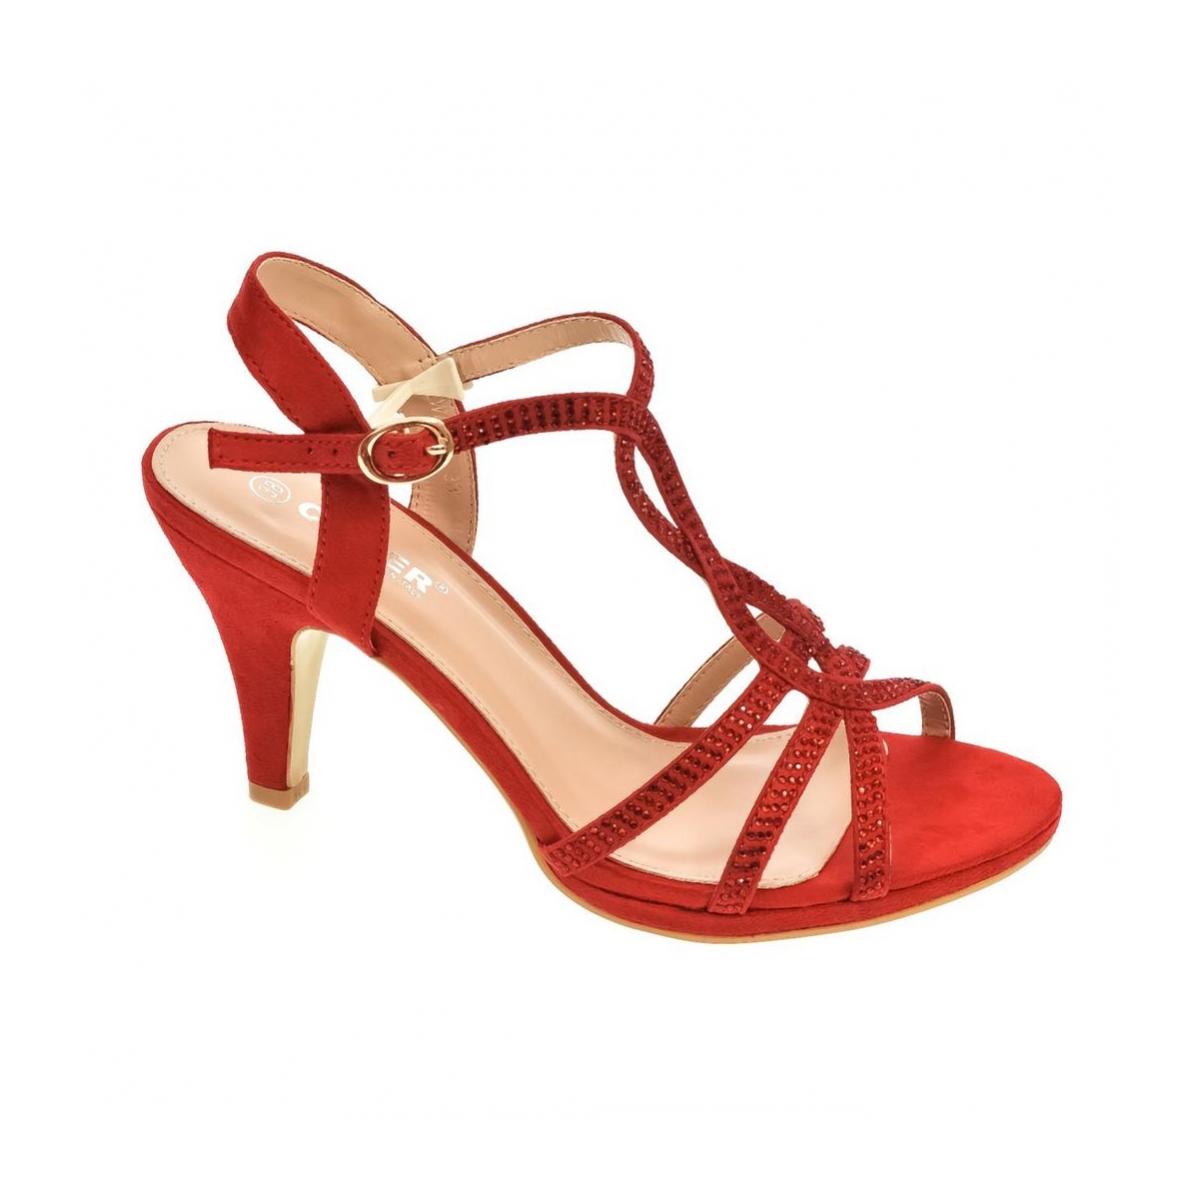 ccc77f23a37f1 Dámske červené sandále LINA   Johnc.sk